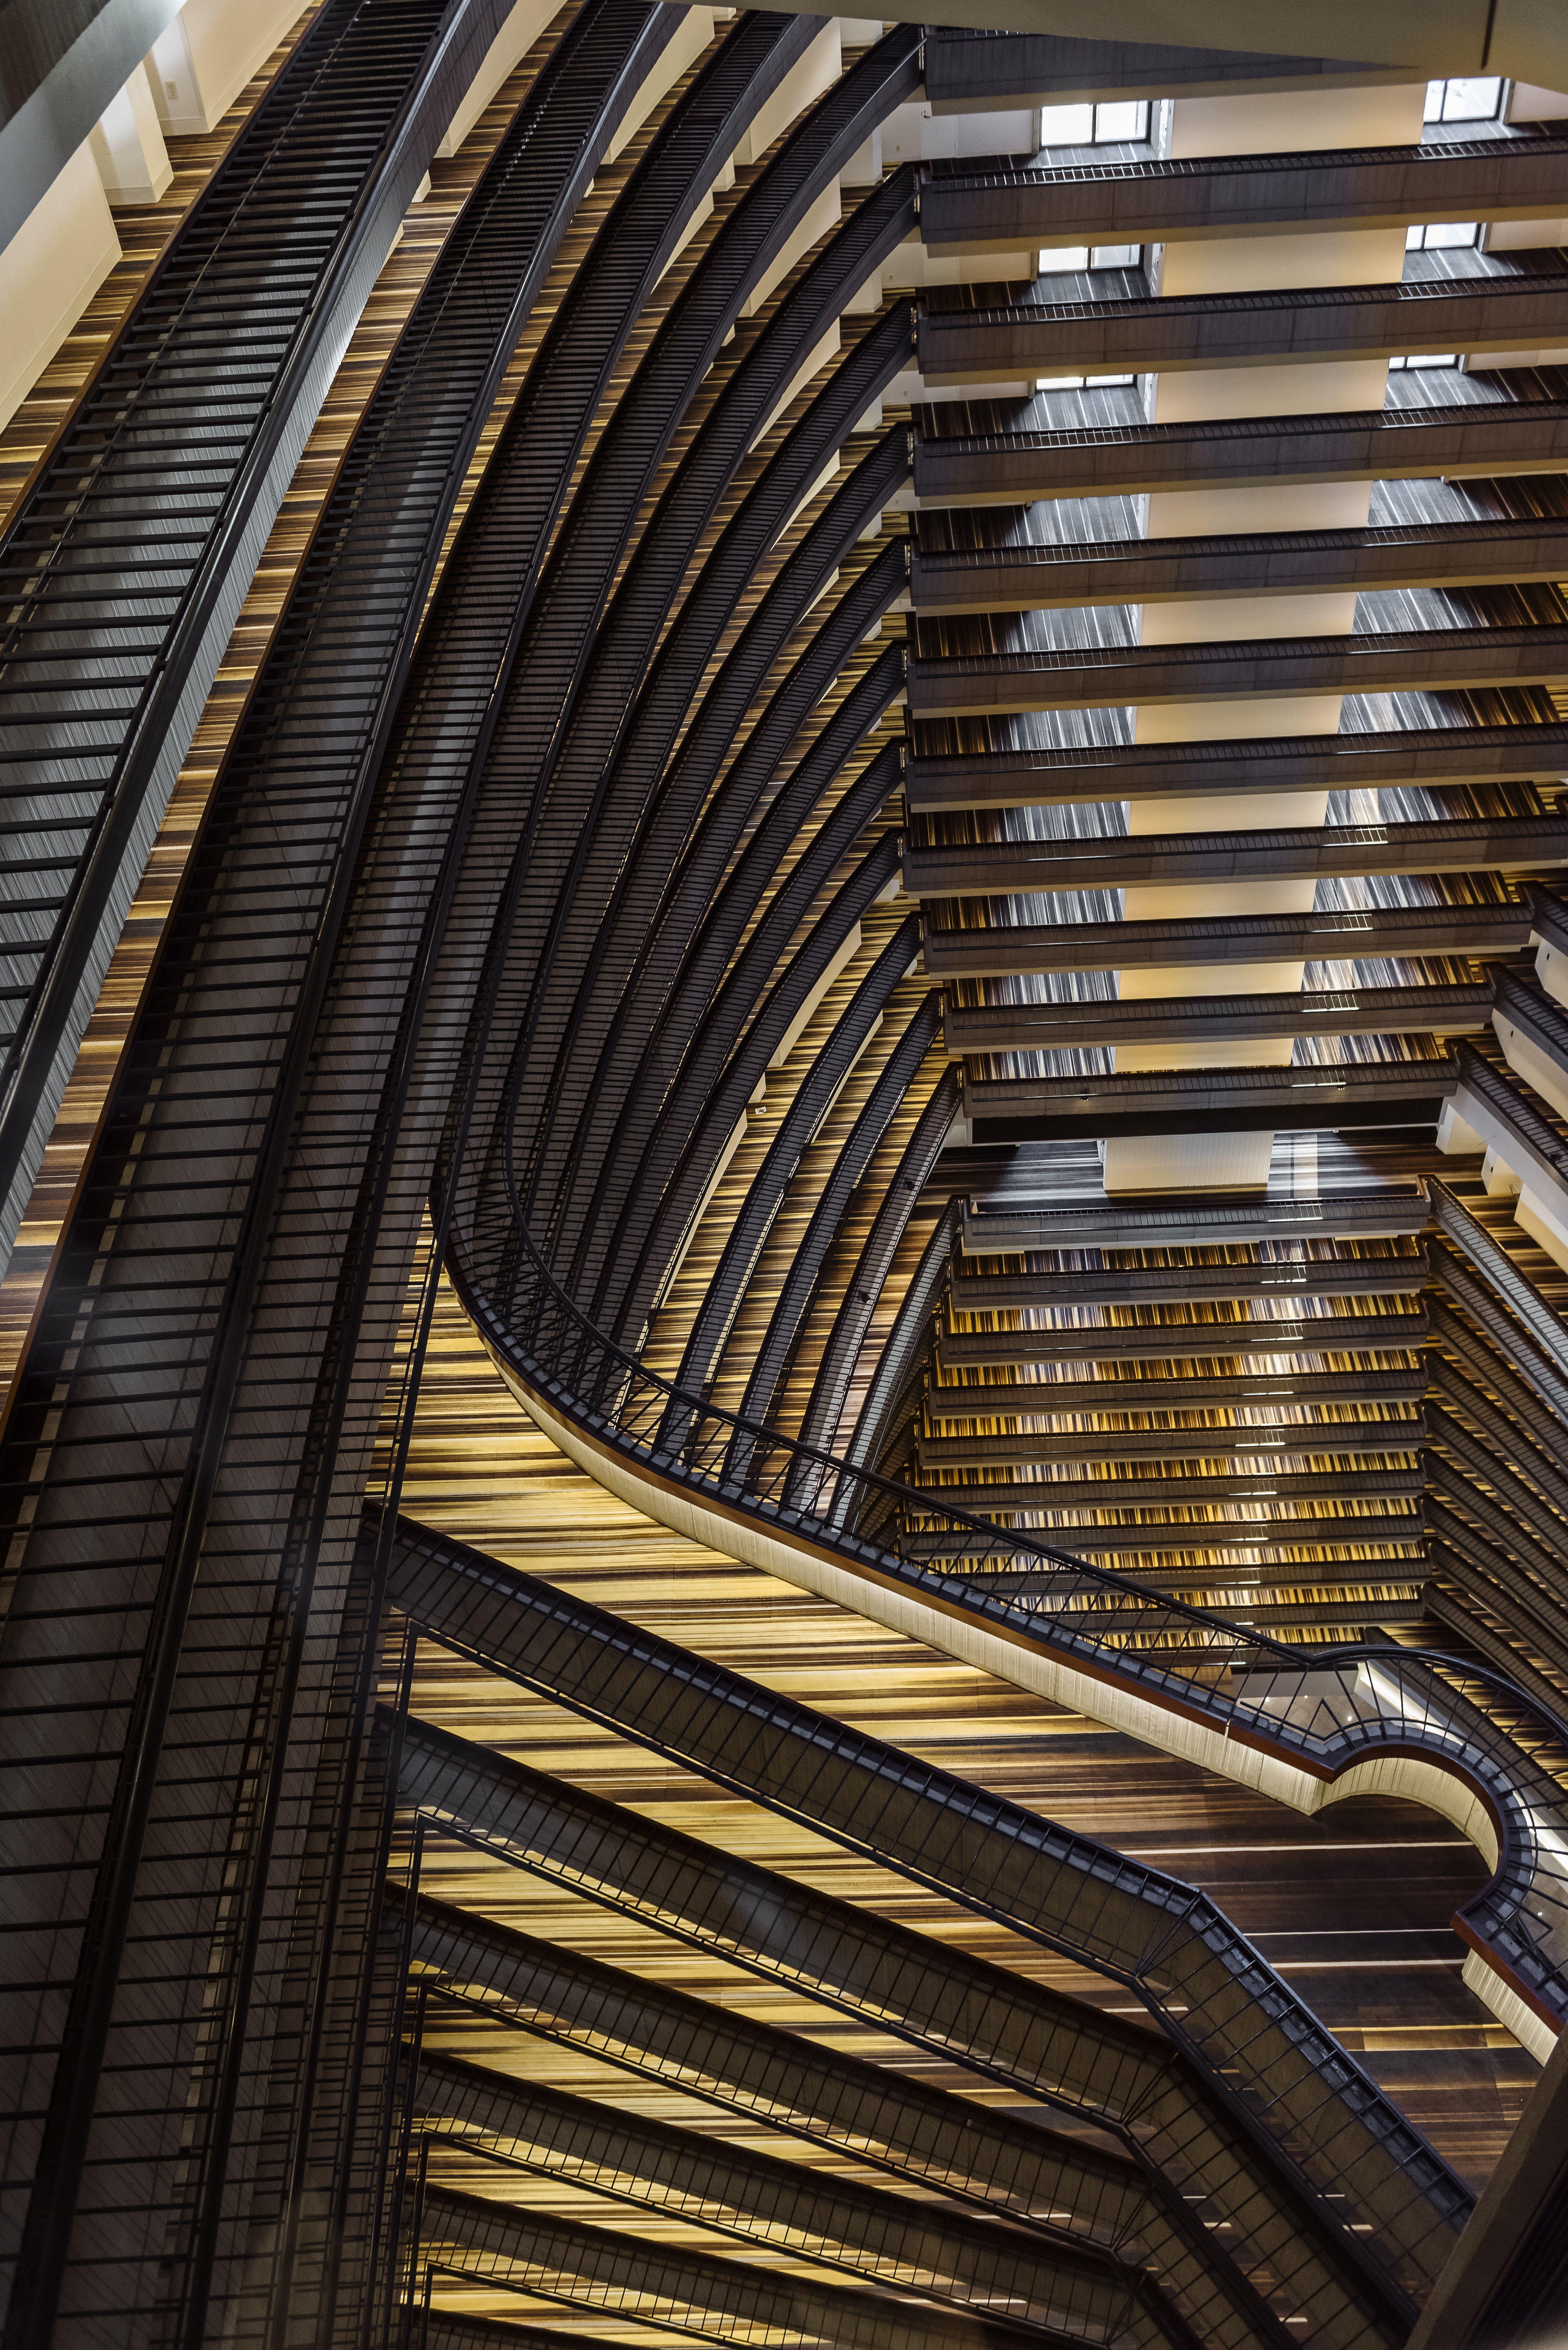 Atlanta Marriott Marquis Deisgned By New York Based Boutique Interior  Design Firm, Krause Sawyer